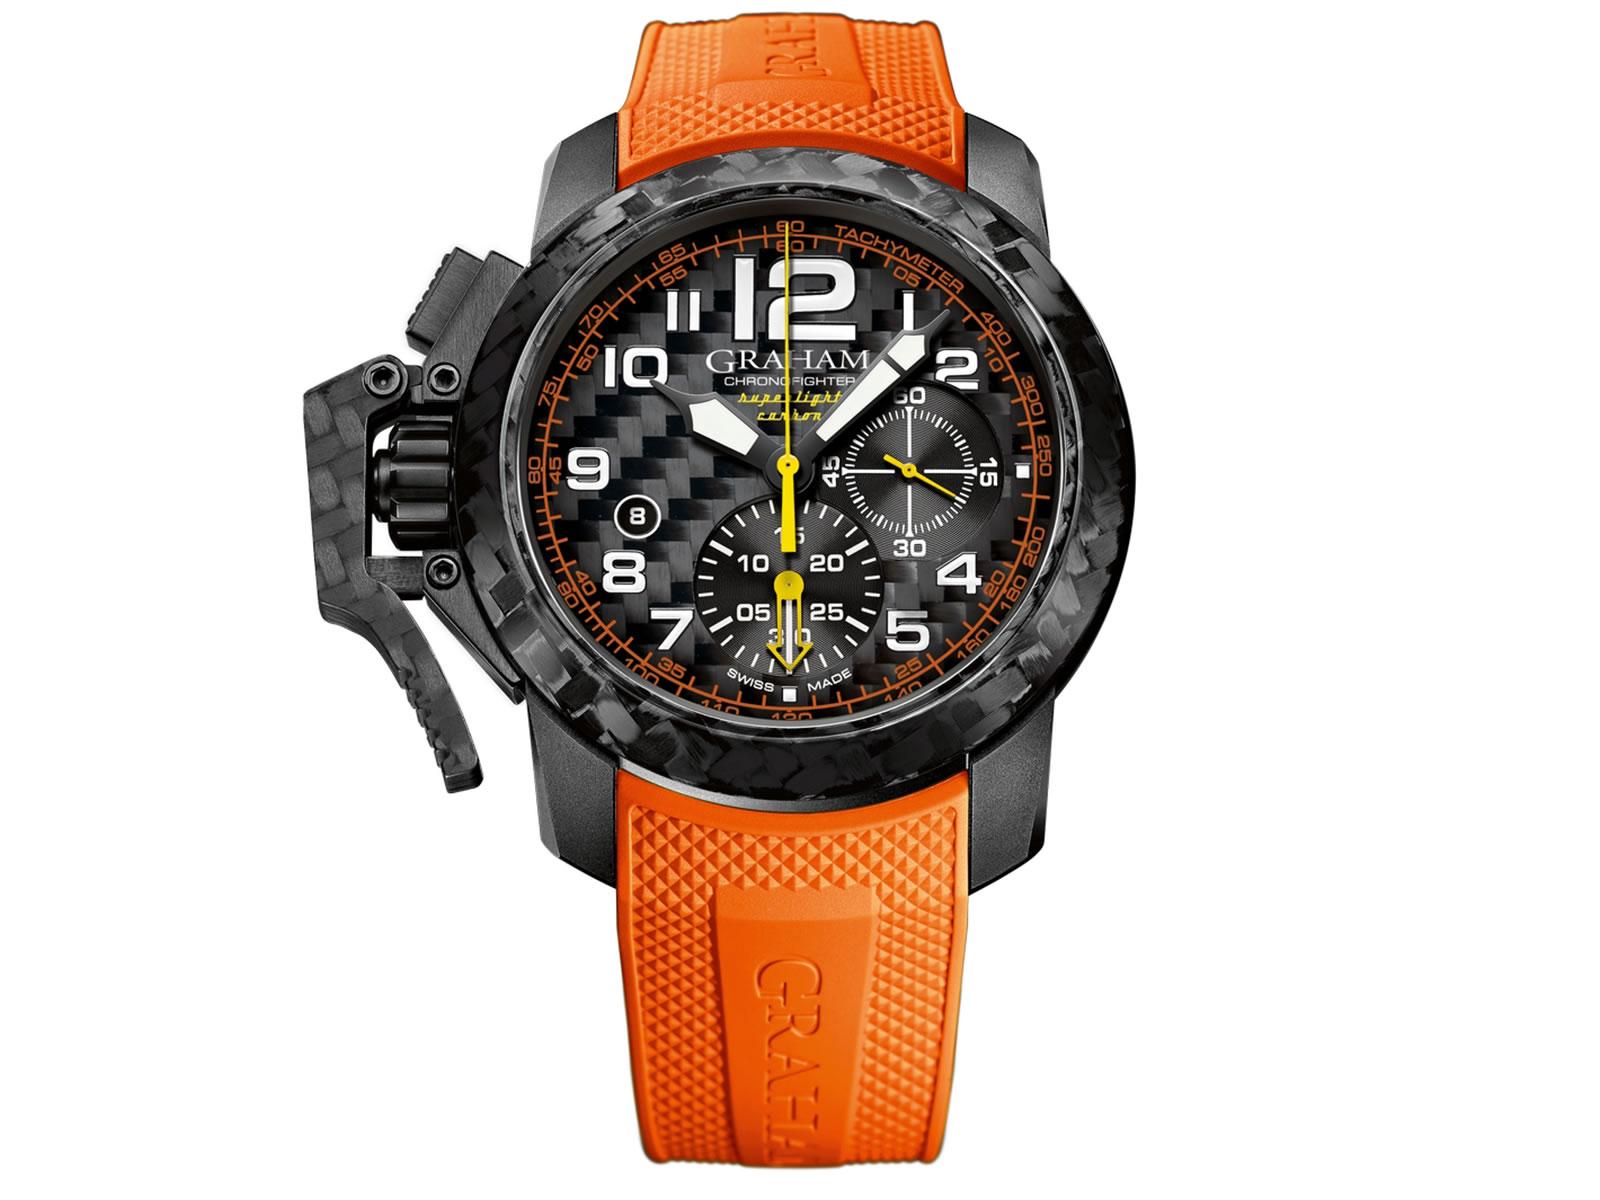 2ccbk-o01a-graham-chronofighter-superlight-karbon gerçek renk-.jpg